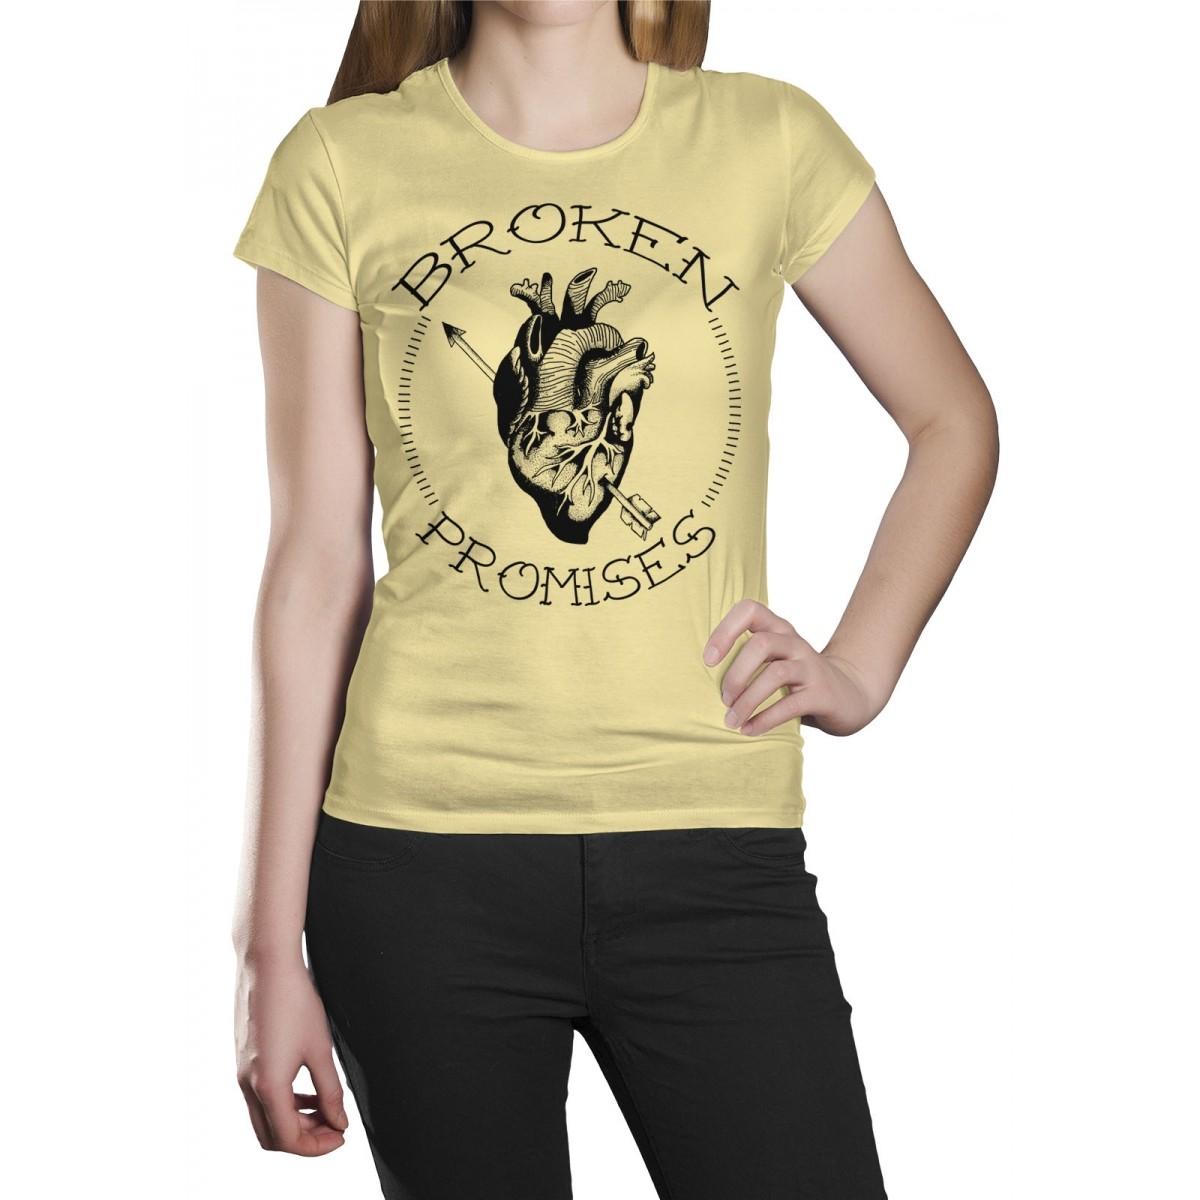 Camiseta HShop Broken Promisses Amarelo  - HShop